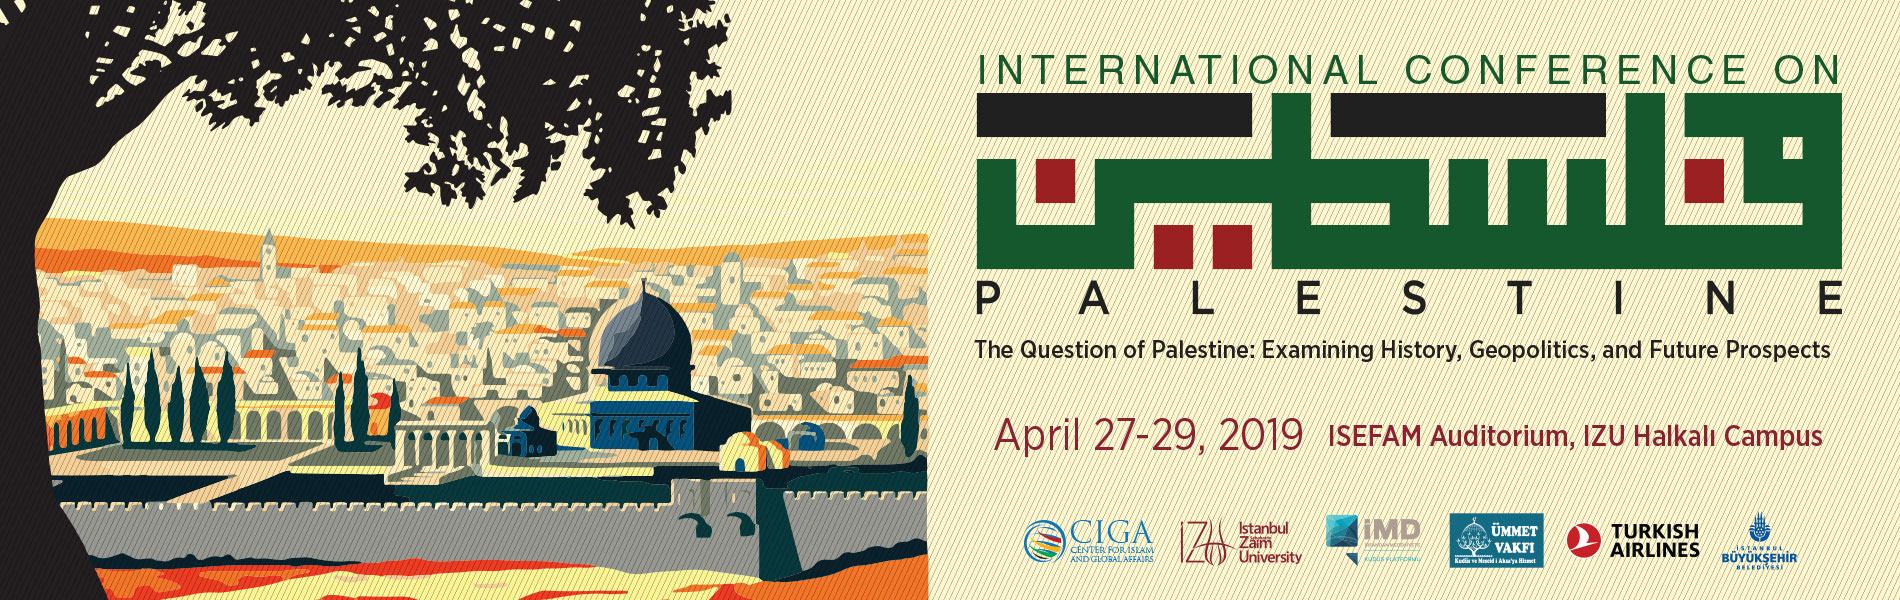 international-conference-on-palestine